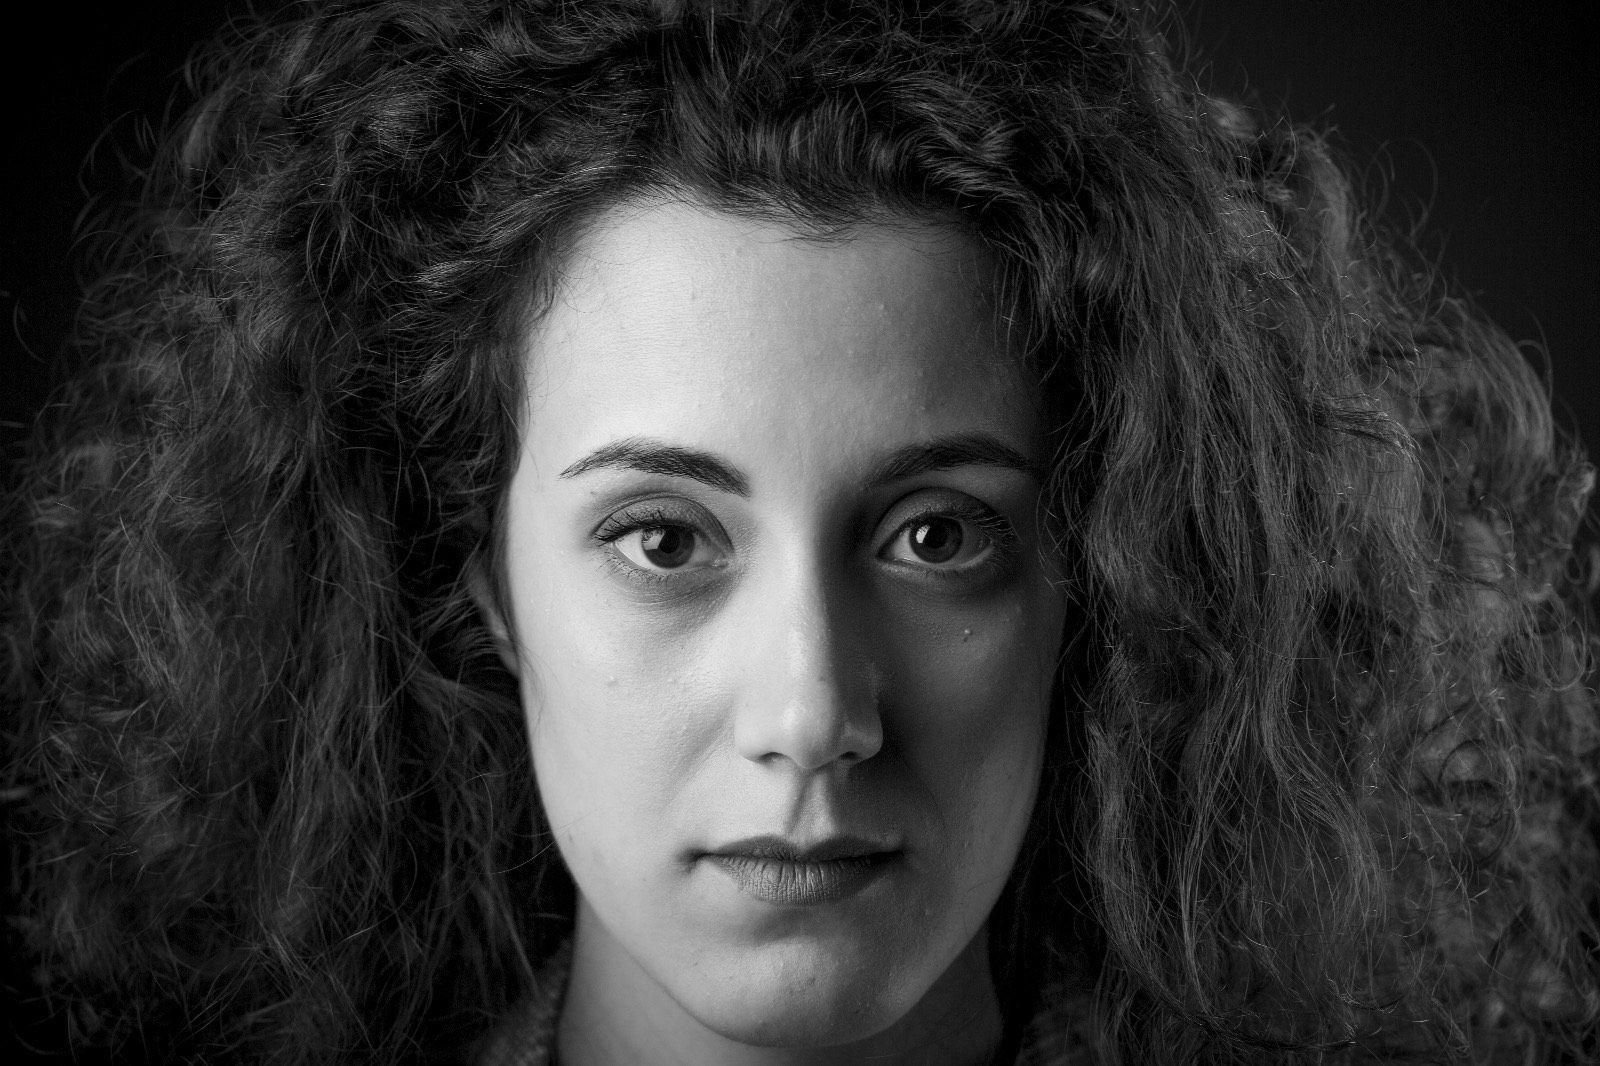 Claudia Ludovica Marino